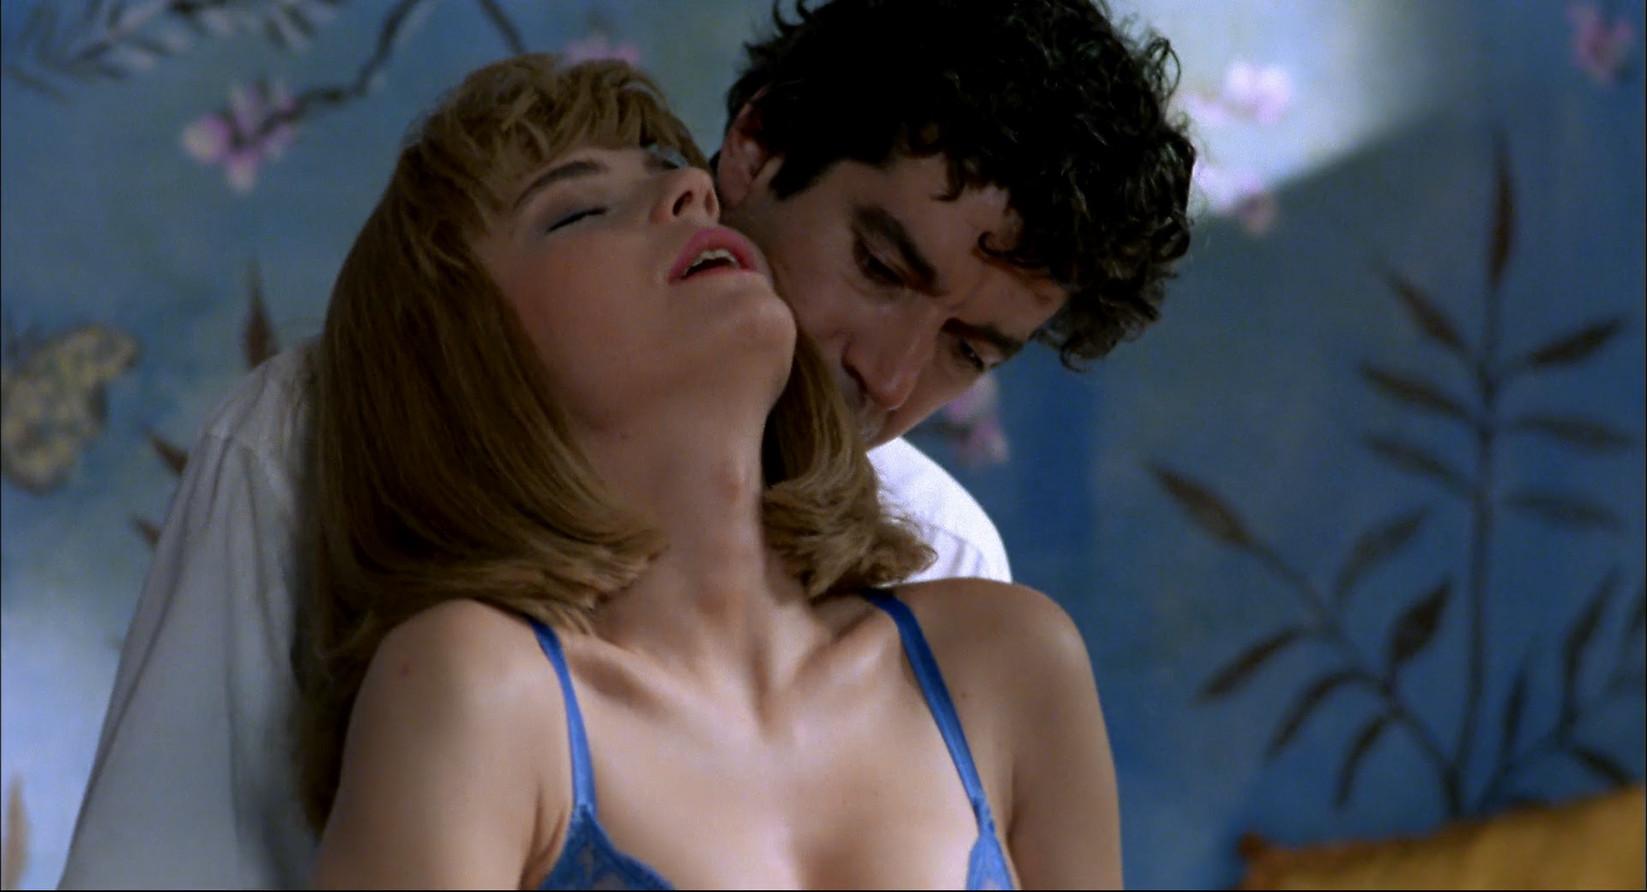 TSJAB8 - Las edades de Lulú | 1990 | Drama. Erótico | BDrip 1080p | castellano DTS 5.1 | 11 GB